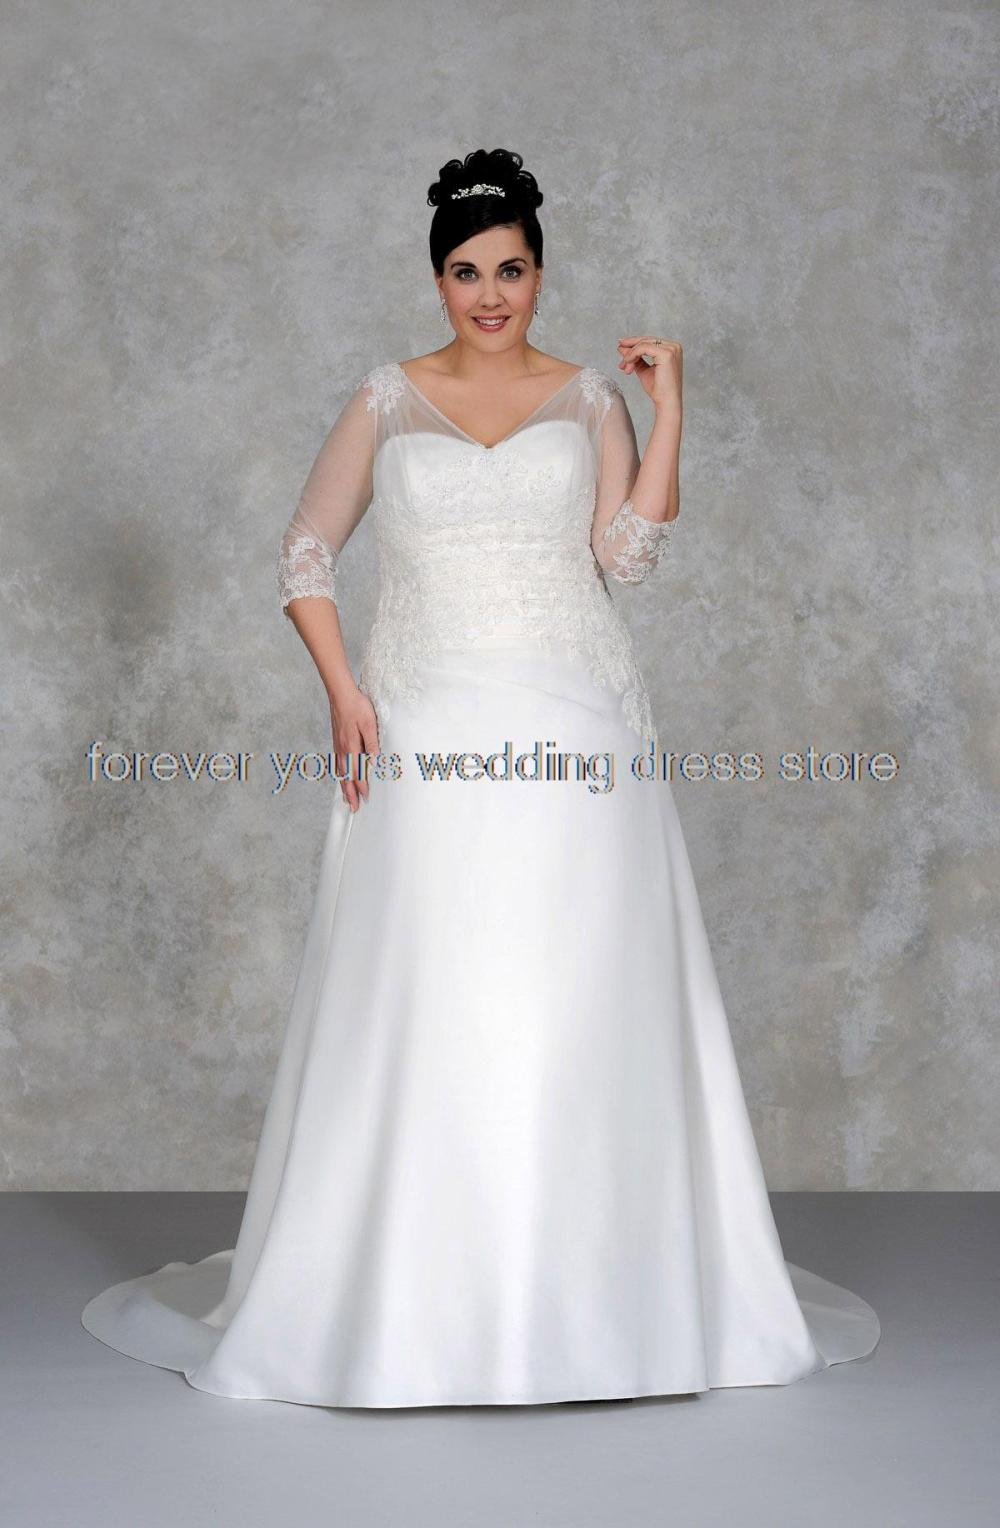 3 4 sleeve V Neck appliques long bridal gown vestido de novia plus size  romantic plus size wedding dress 2015 NT 096-in Wedding Dresses from  Weddings ... e6e328bc687e